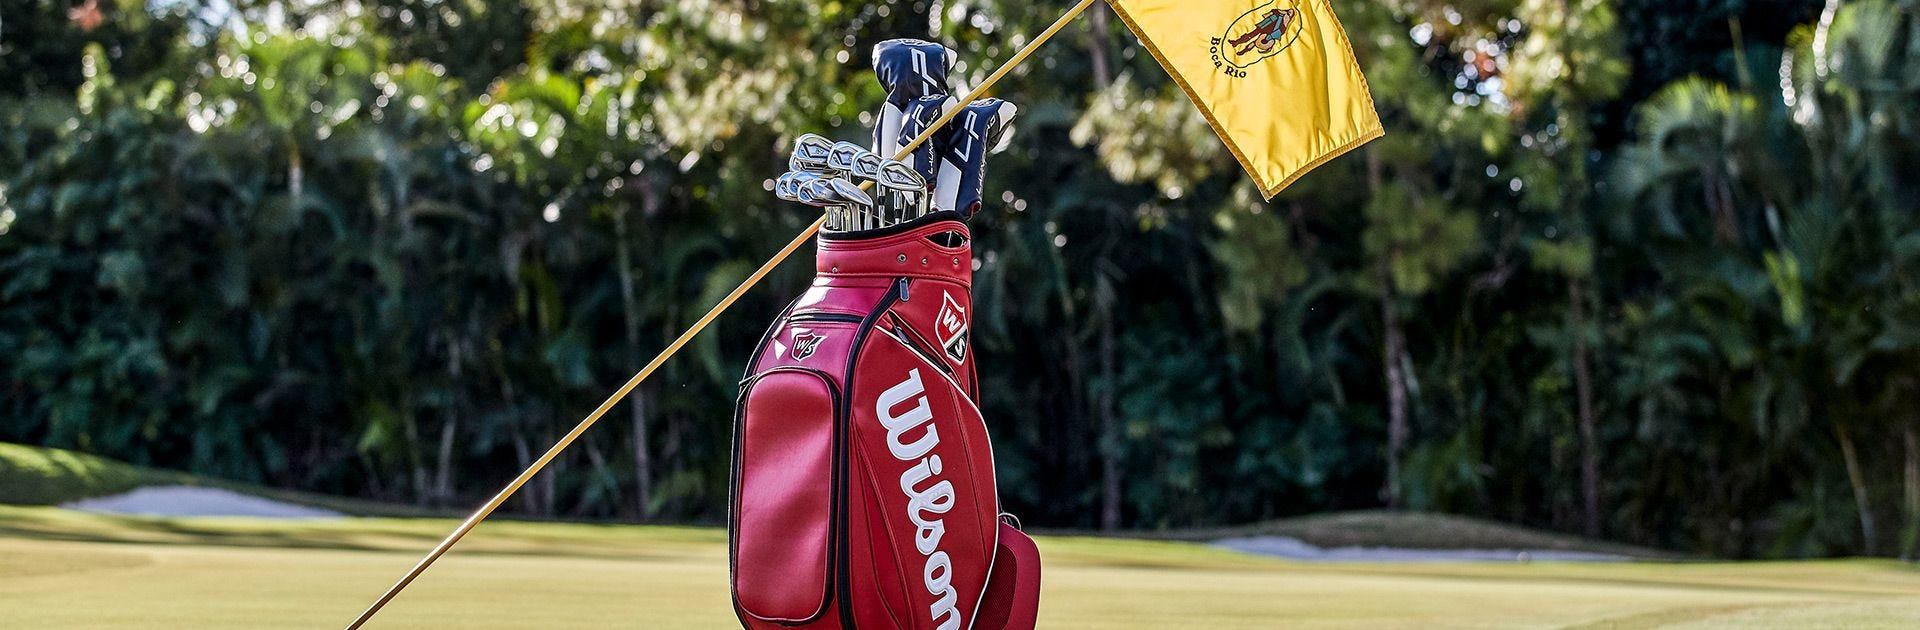 Pin flag resting on Wilson Golf bag